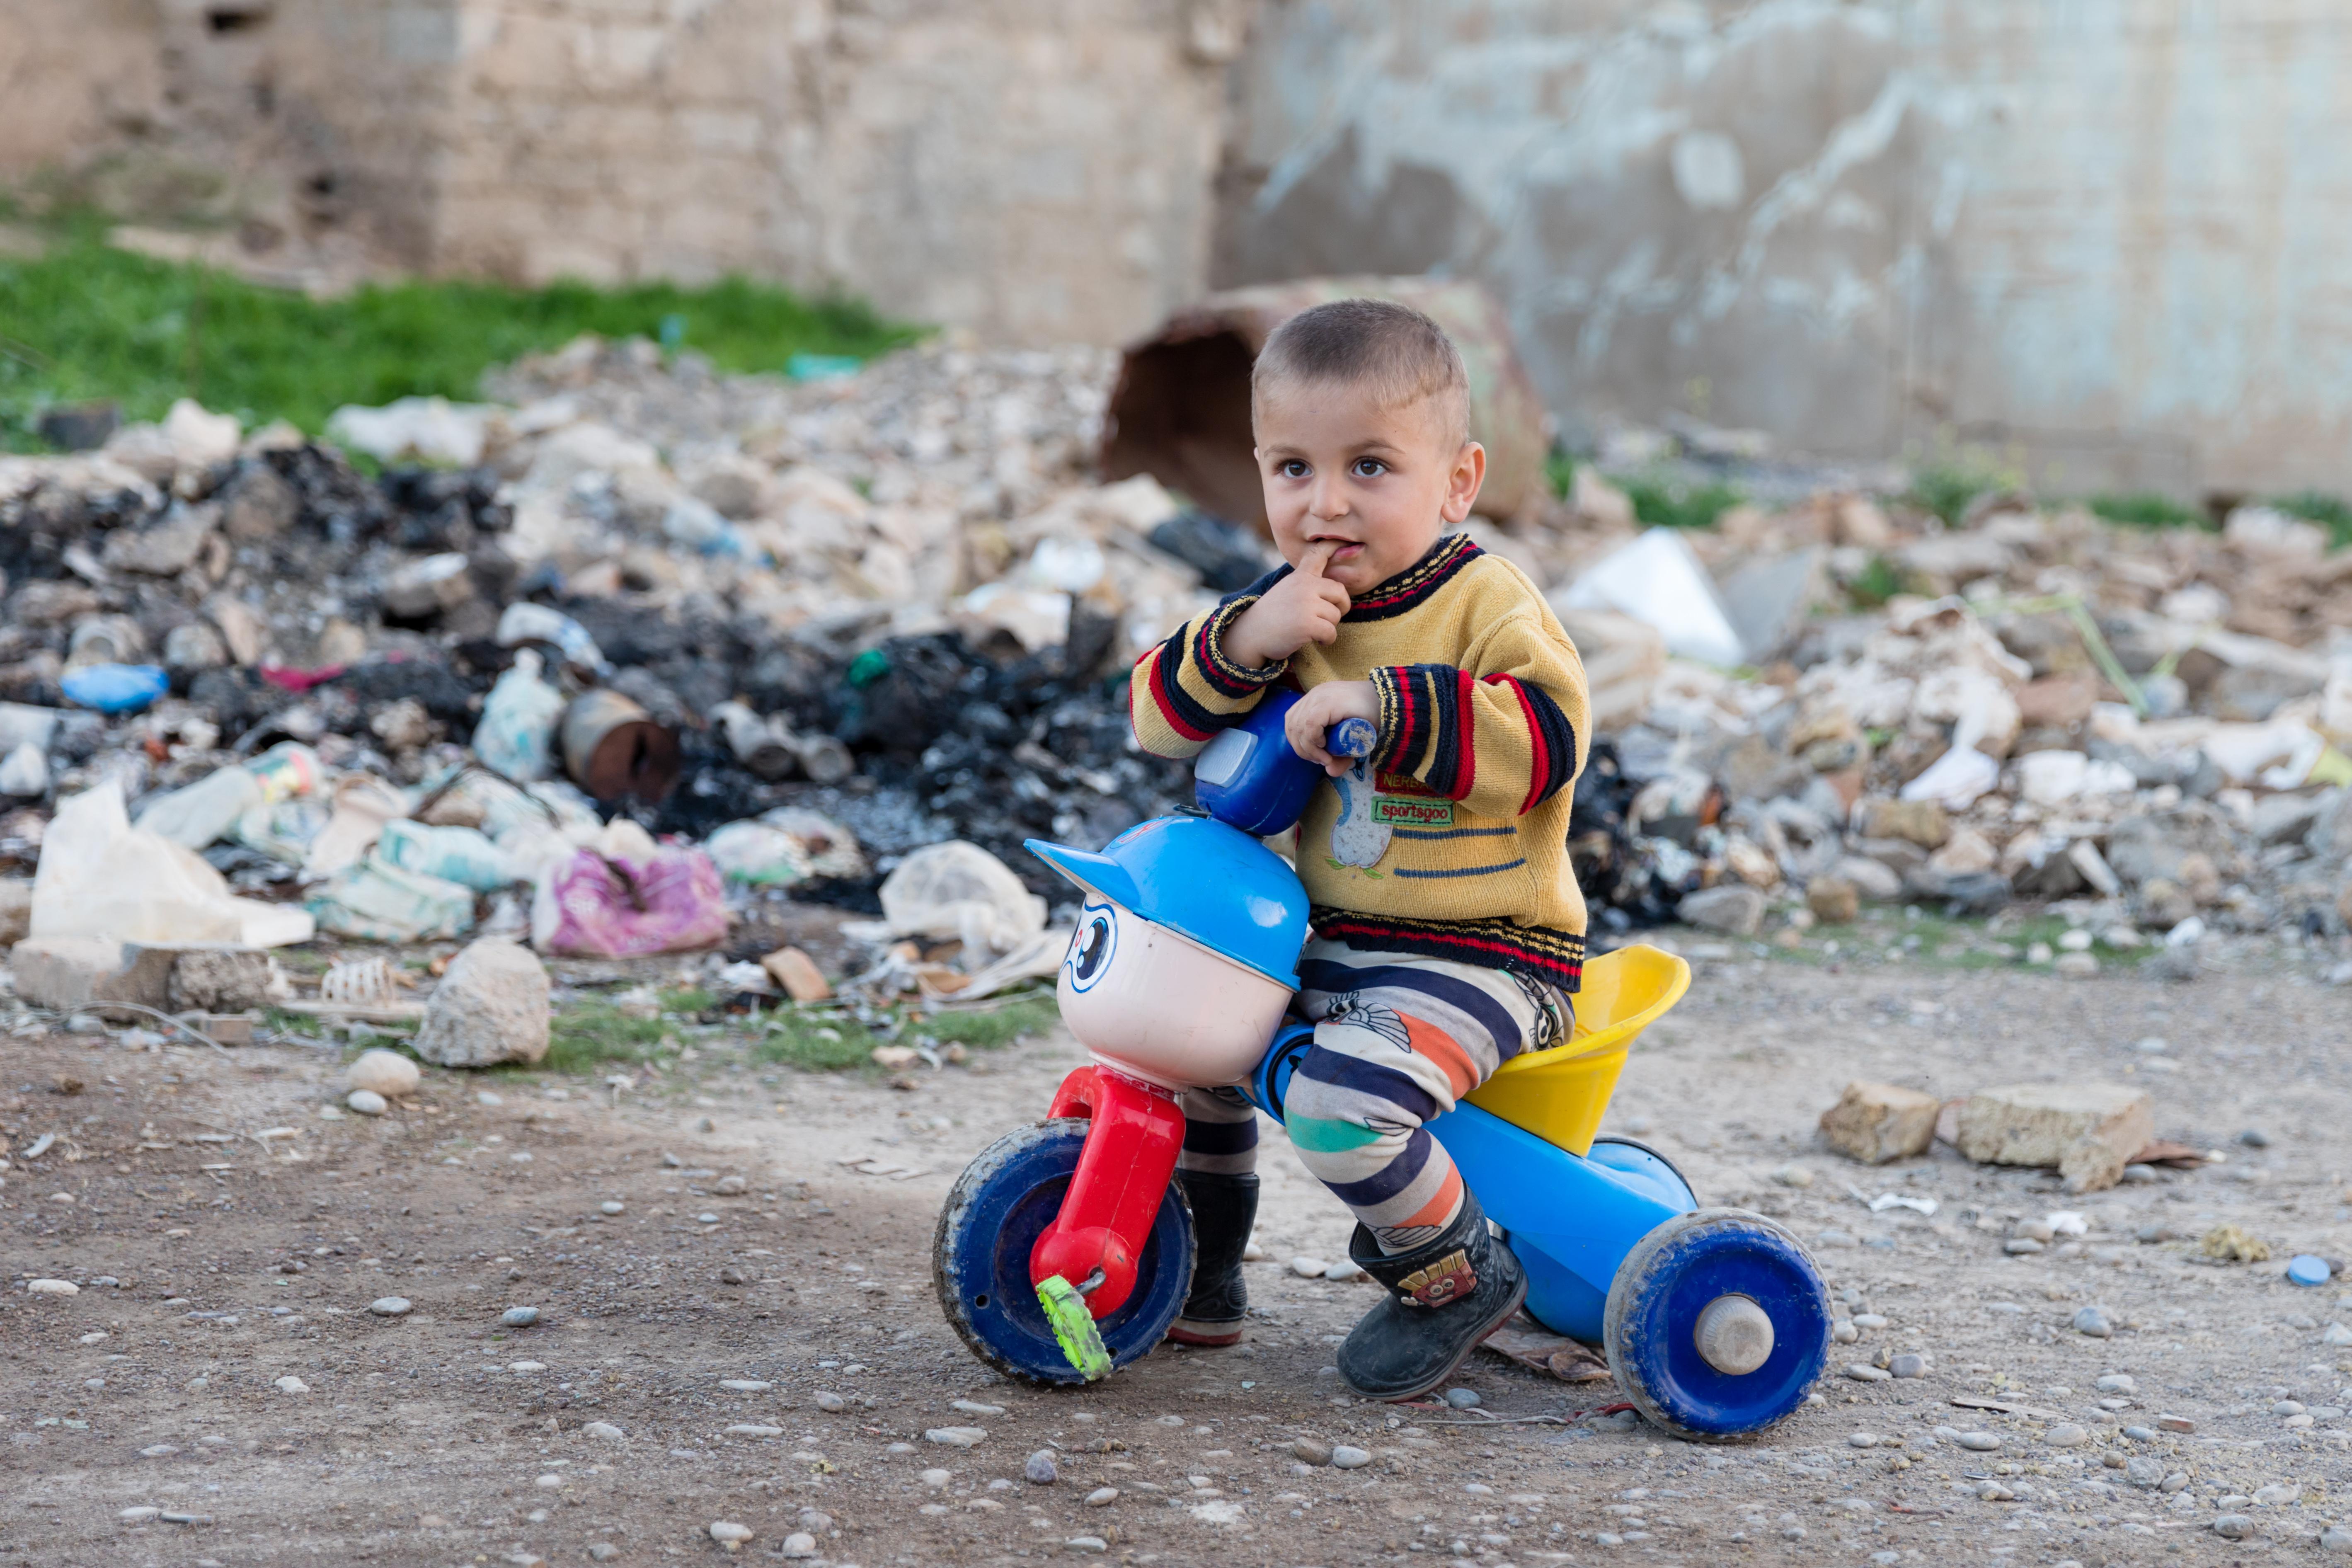 The streets of Qaraqosh are still full of rubble (World Watch Monitor)